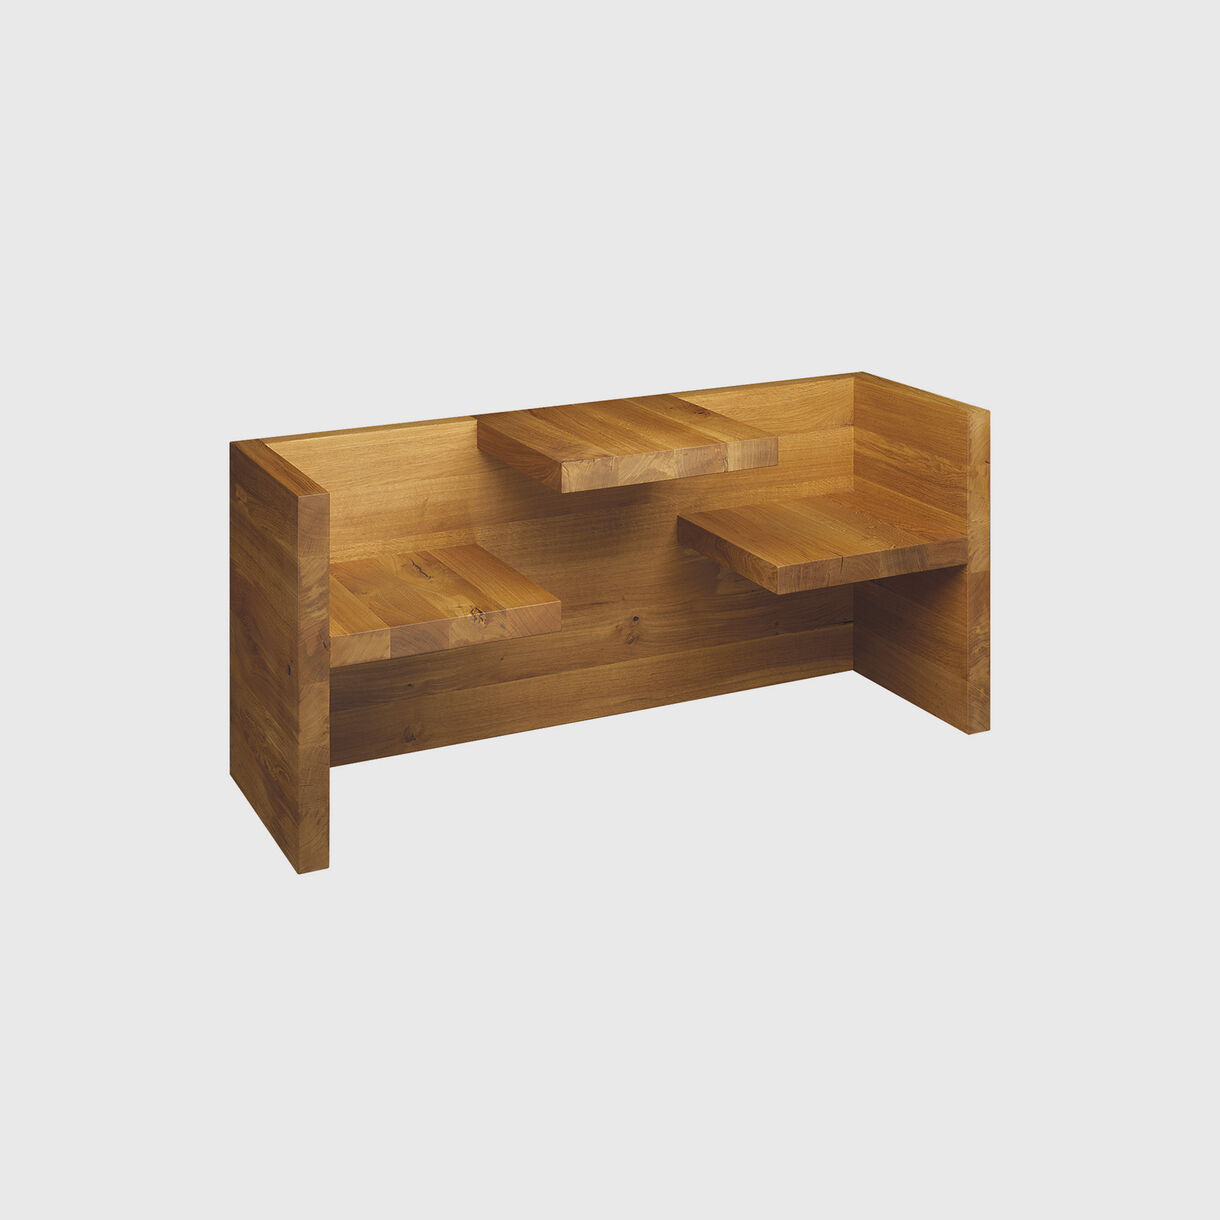 Tafel Table Bench, European Oak